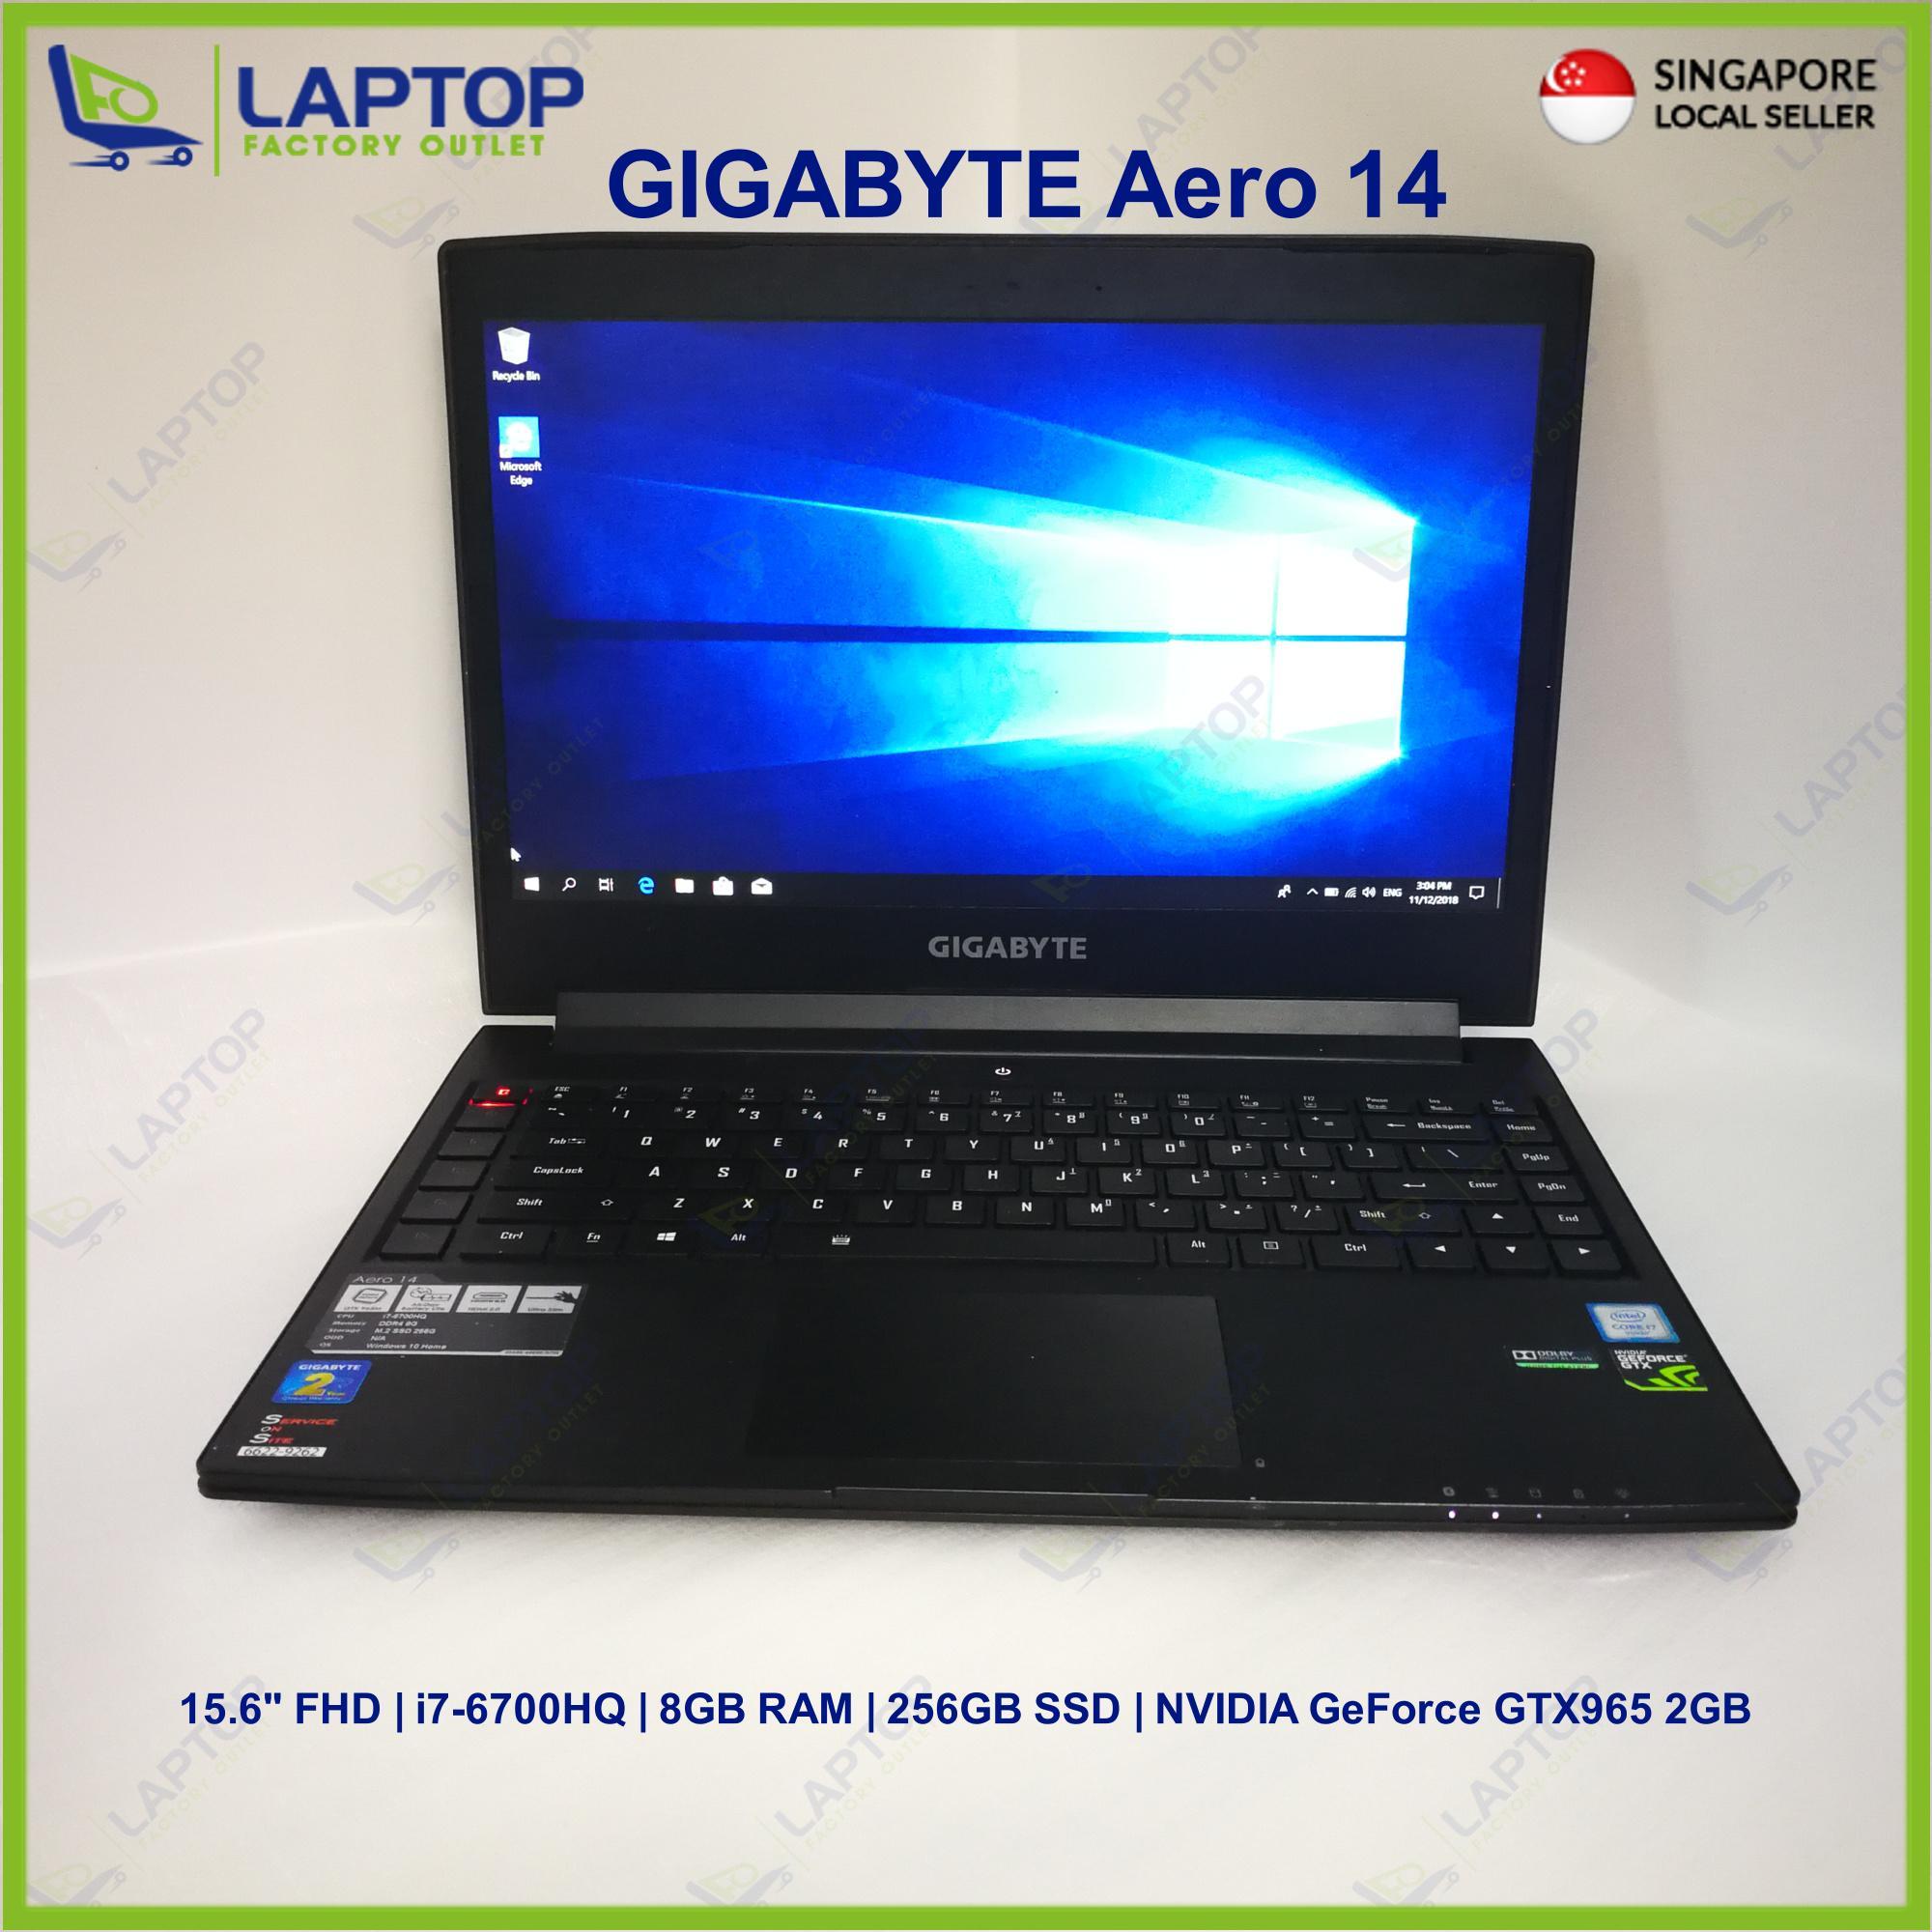 GIGABYTE Aero 14 (i7-6/8GB/256GB) @gaming @ Premium Preowned [Refurbished]